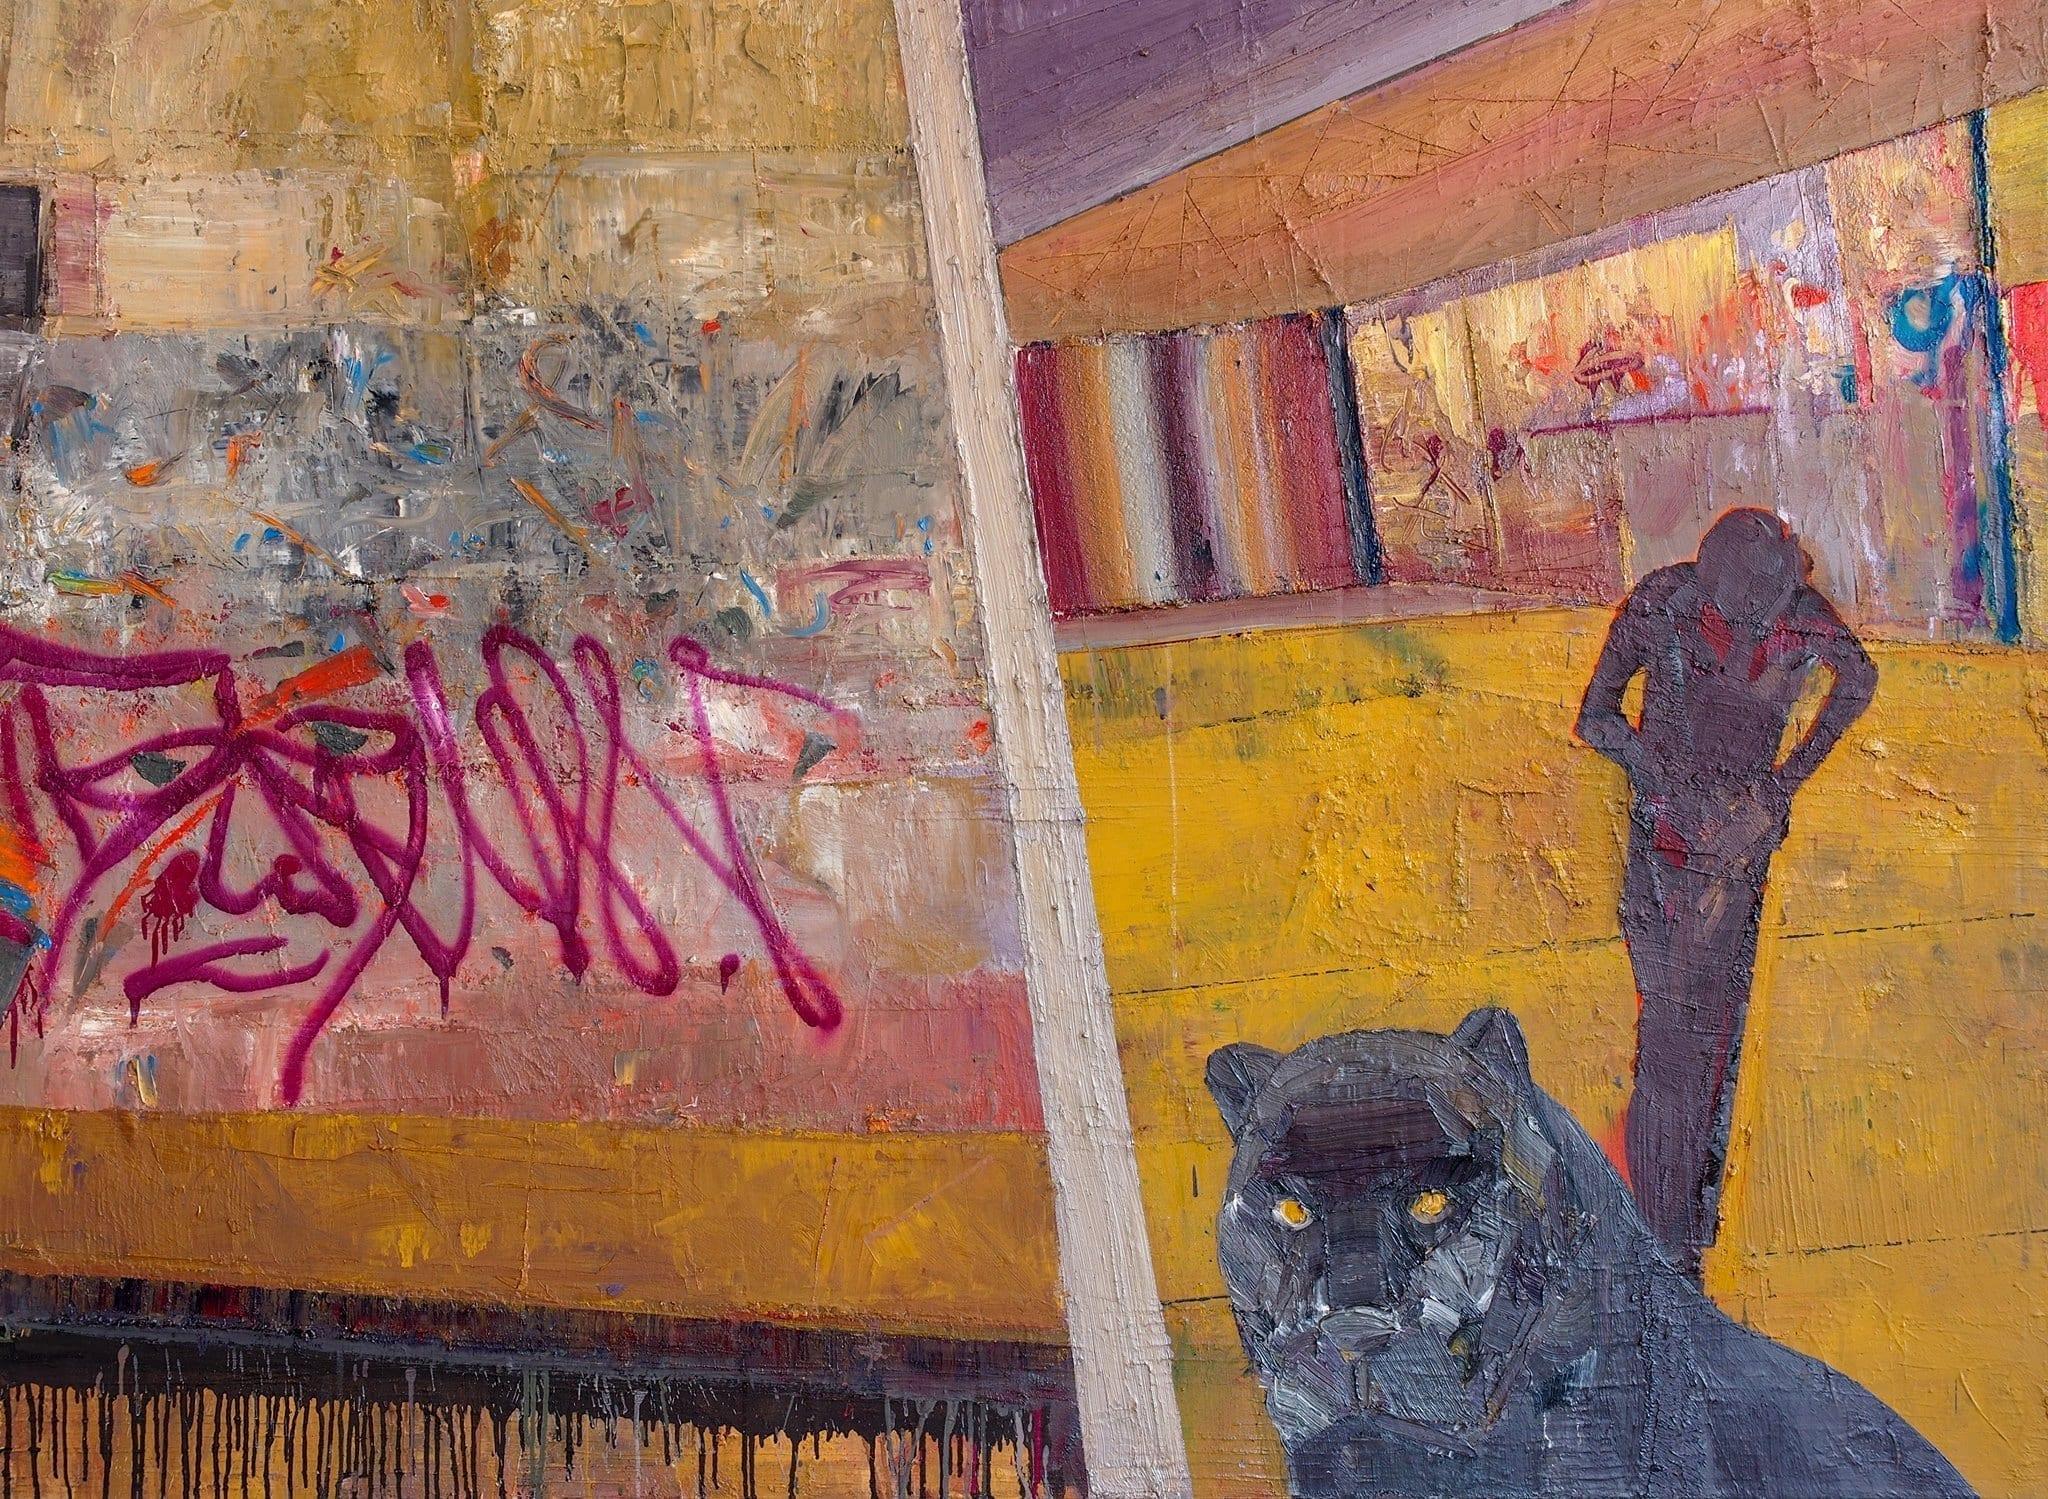 The Secret Passages of Ioan Muresan @ Zorzini Gallery